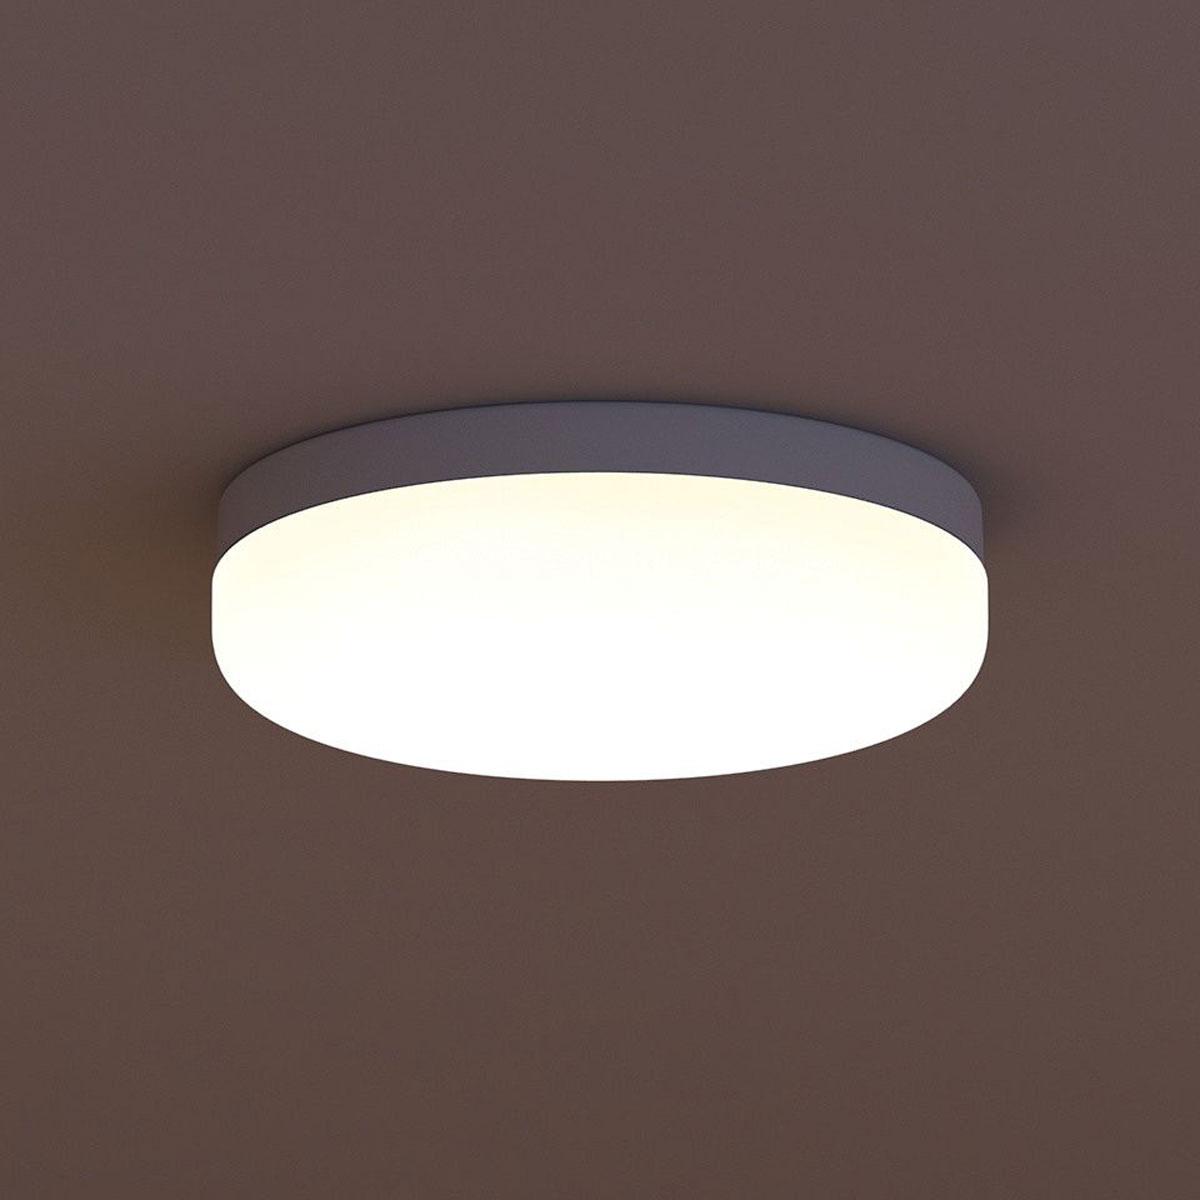 Philips Mybathroom Baume Plafondlamp Wit